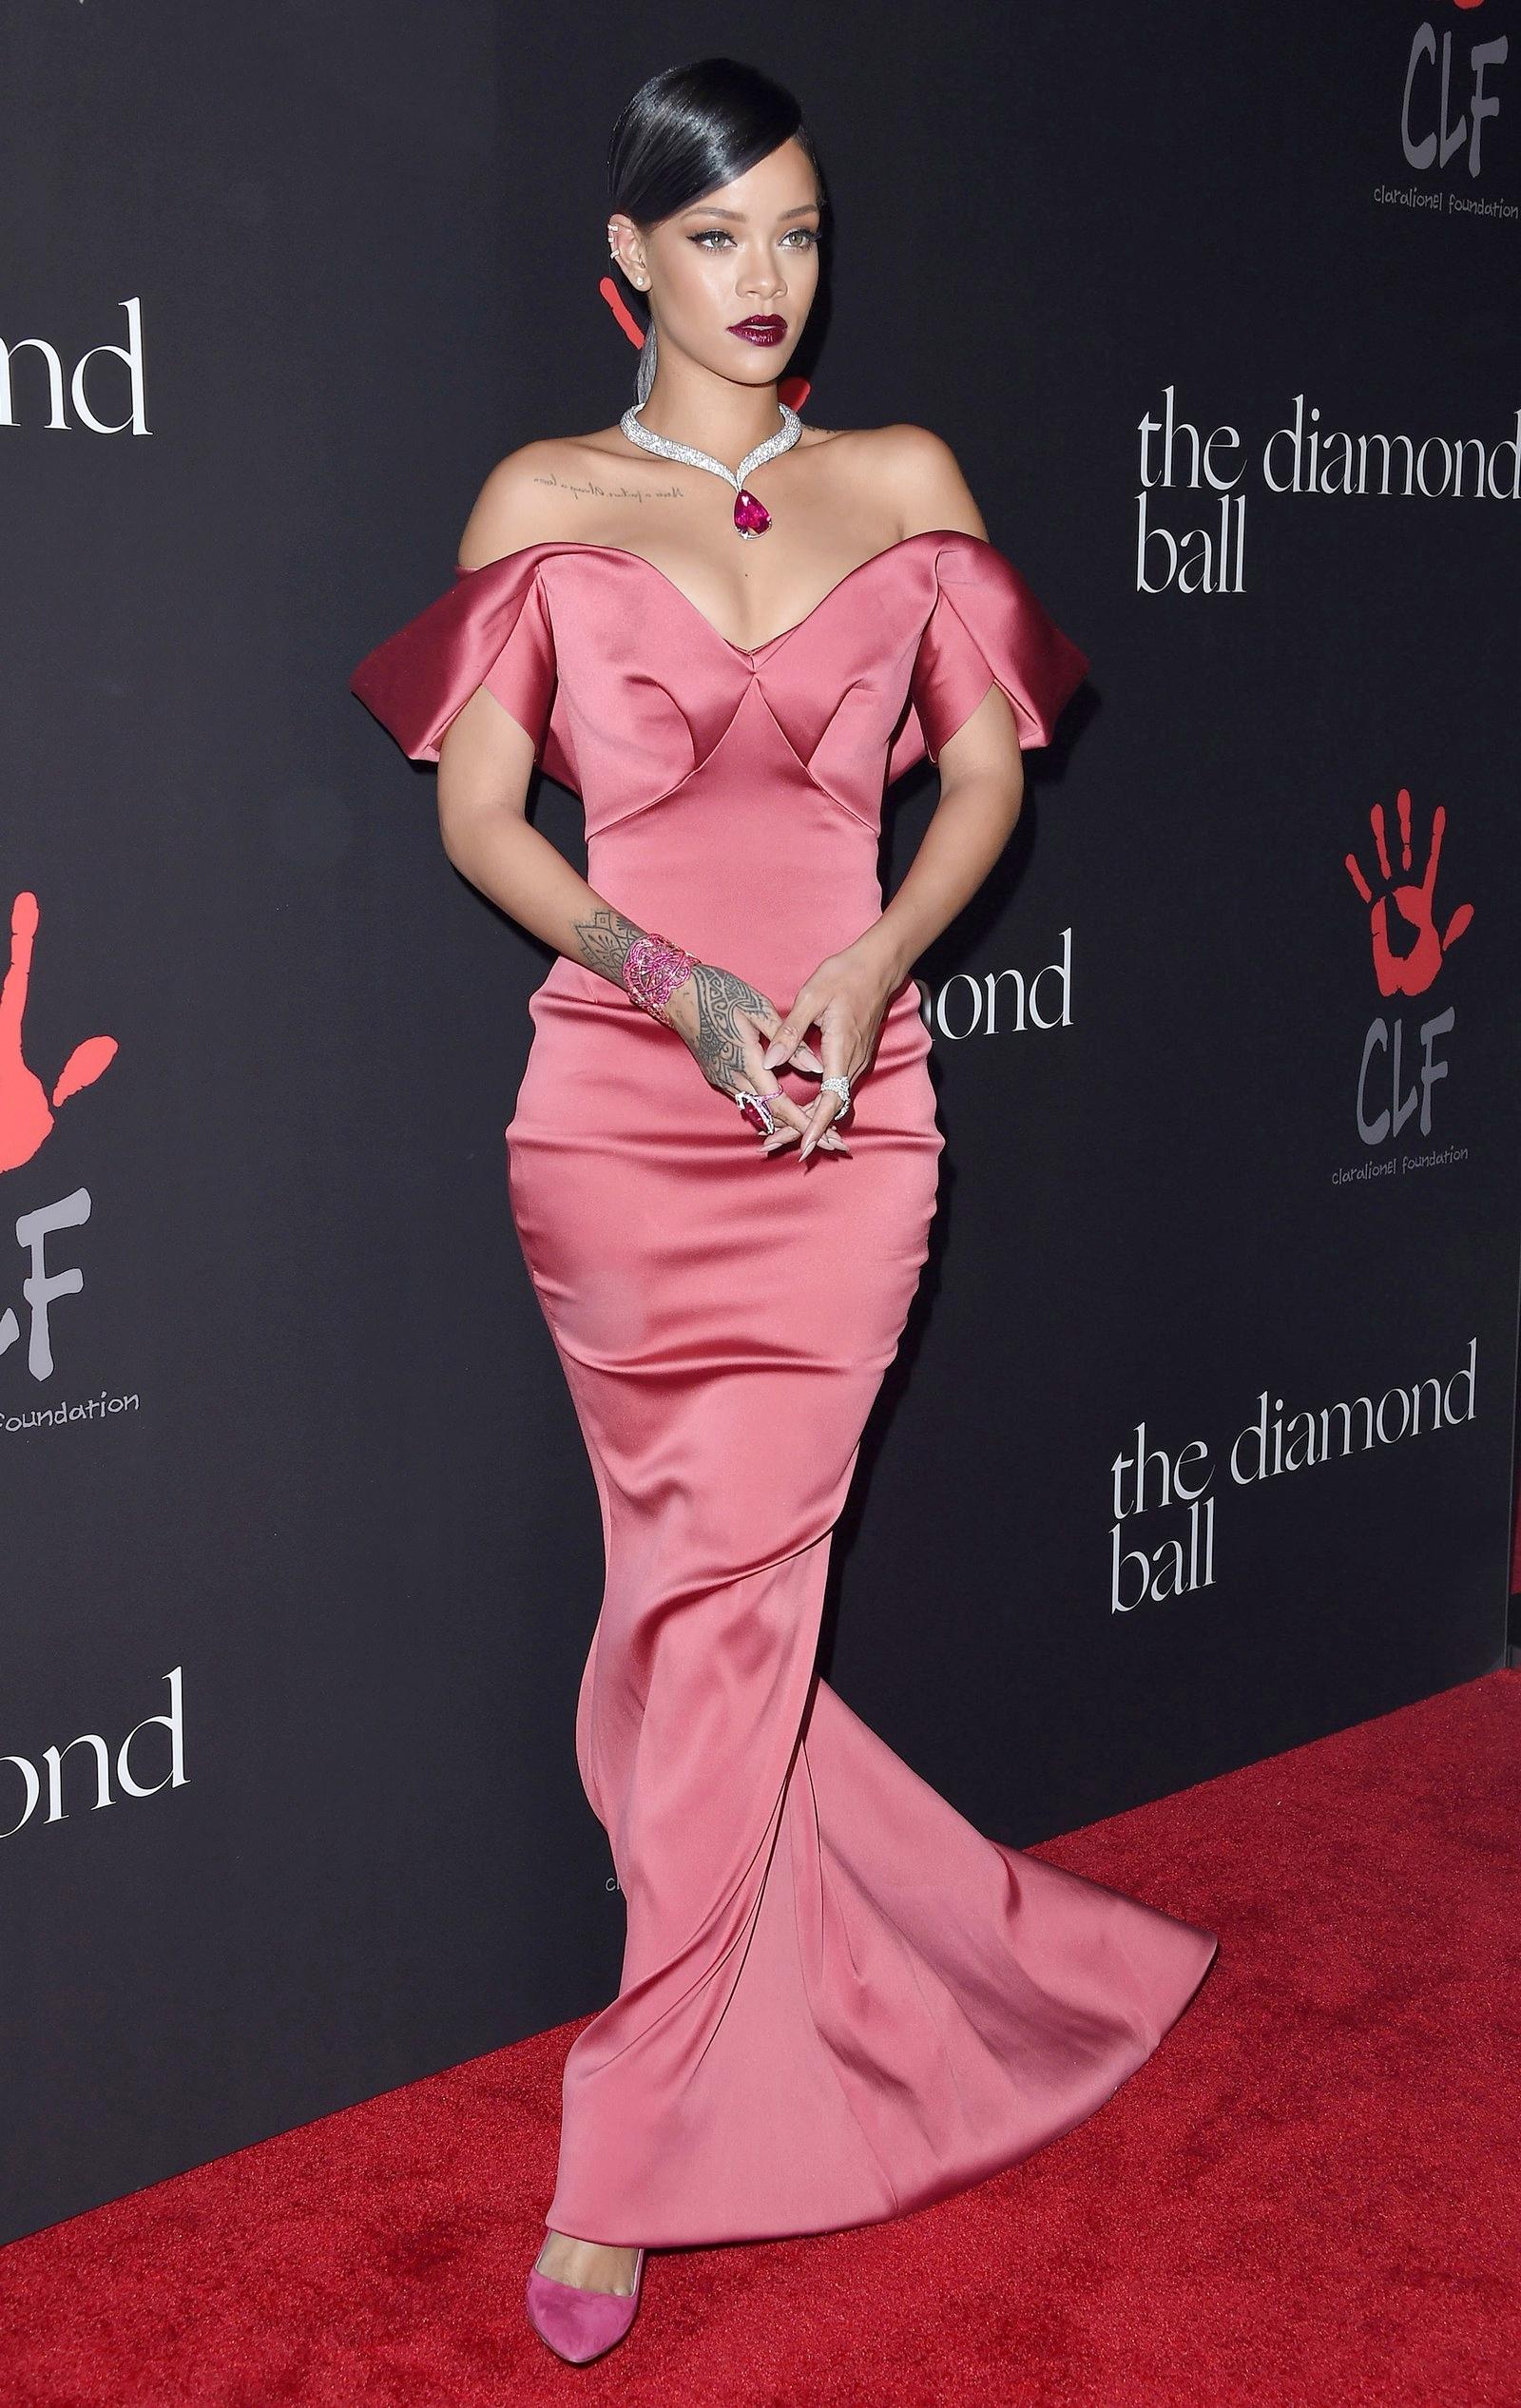 Рианна в платье Zac Posen на Diamond Ball 2014